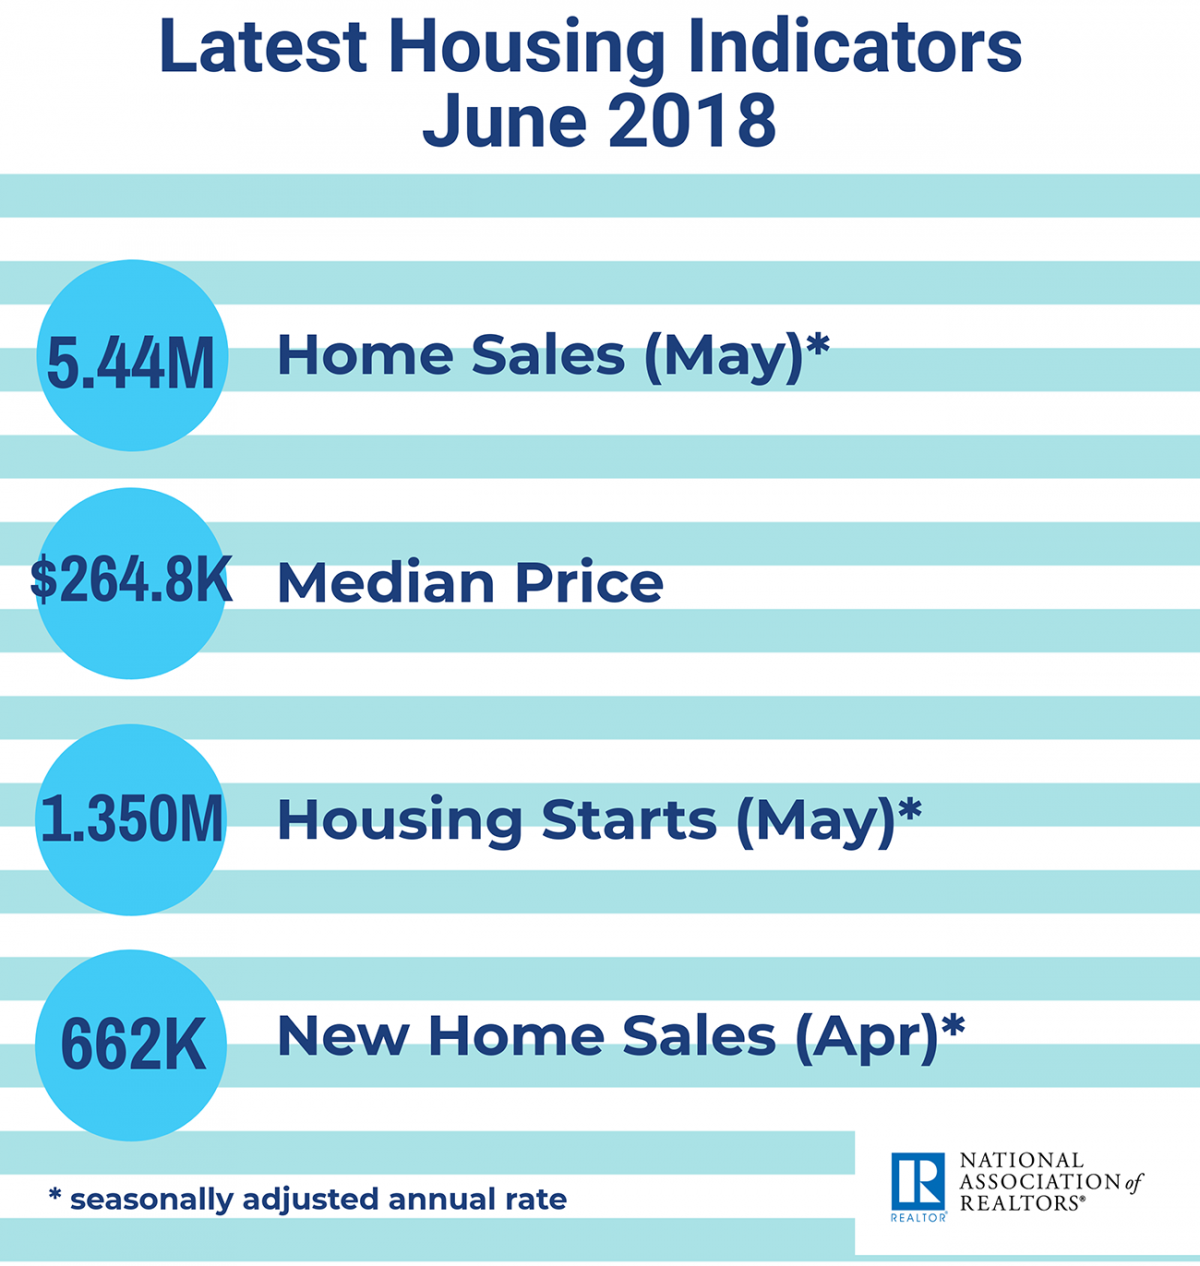 June 2018 Housing Indicators infographic